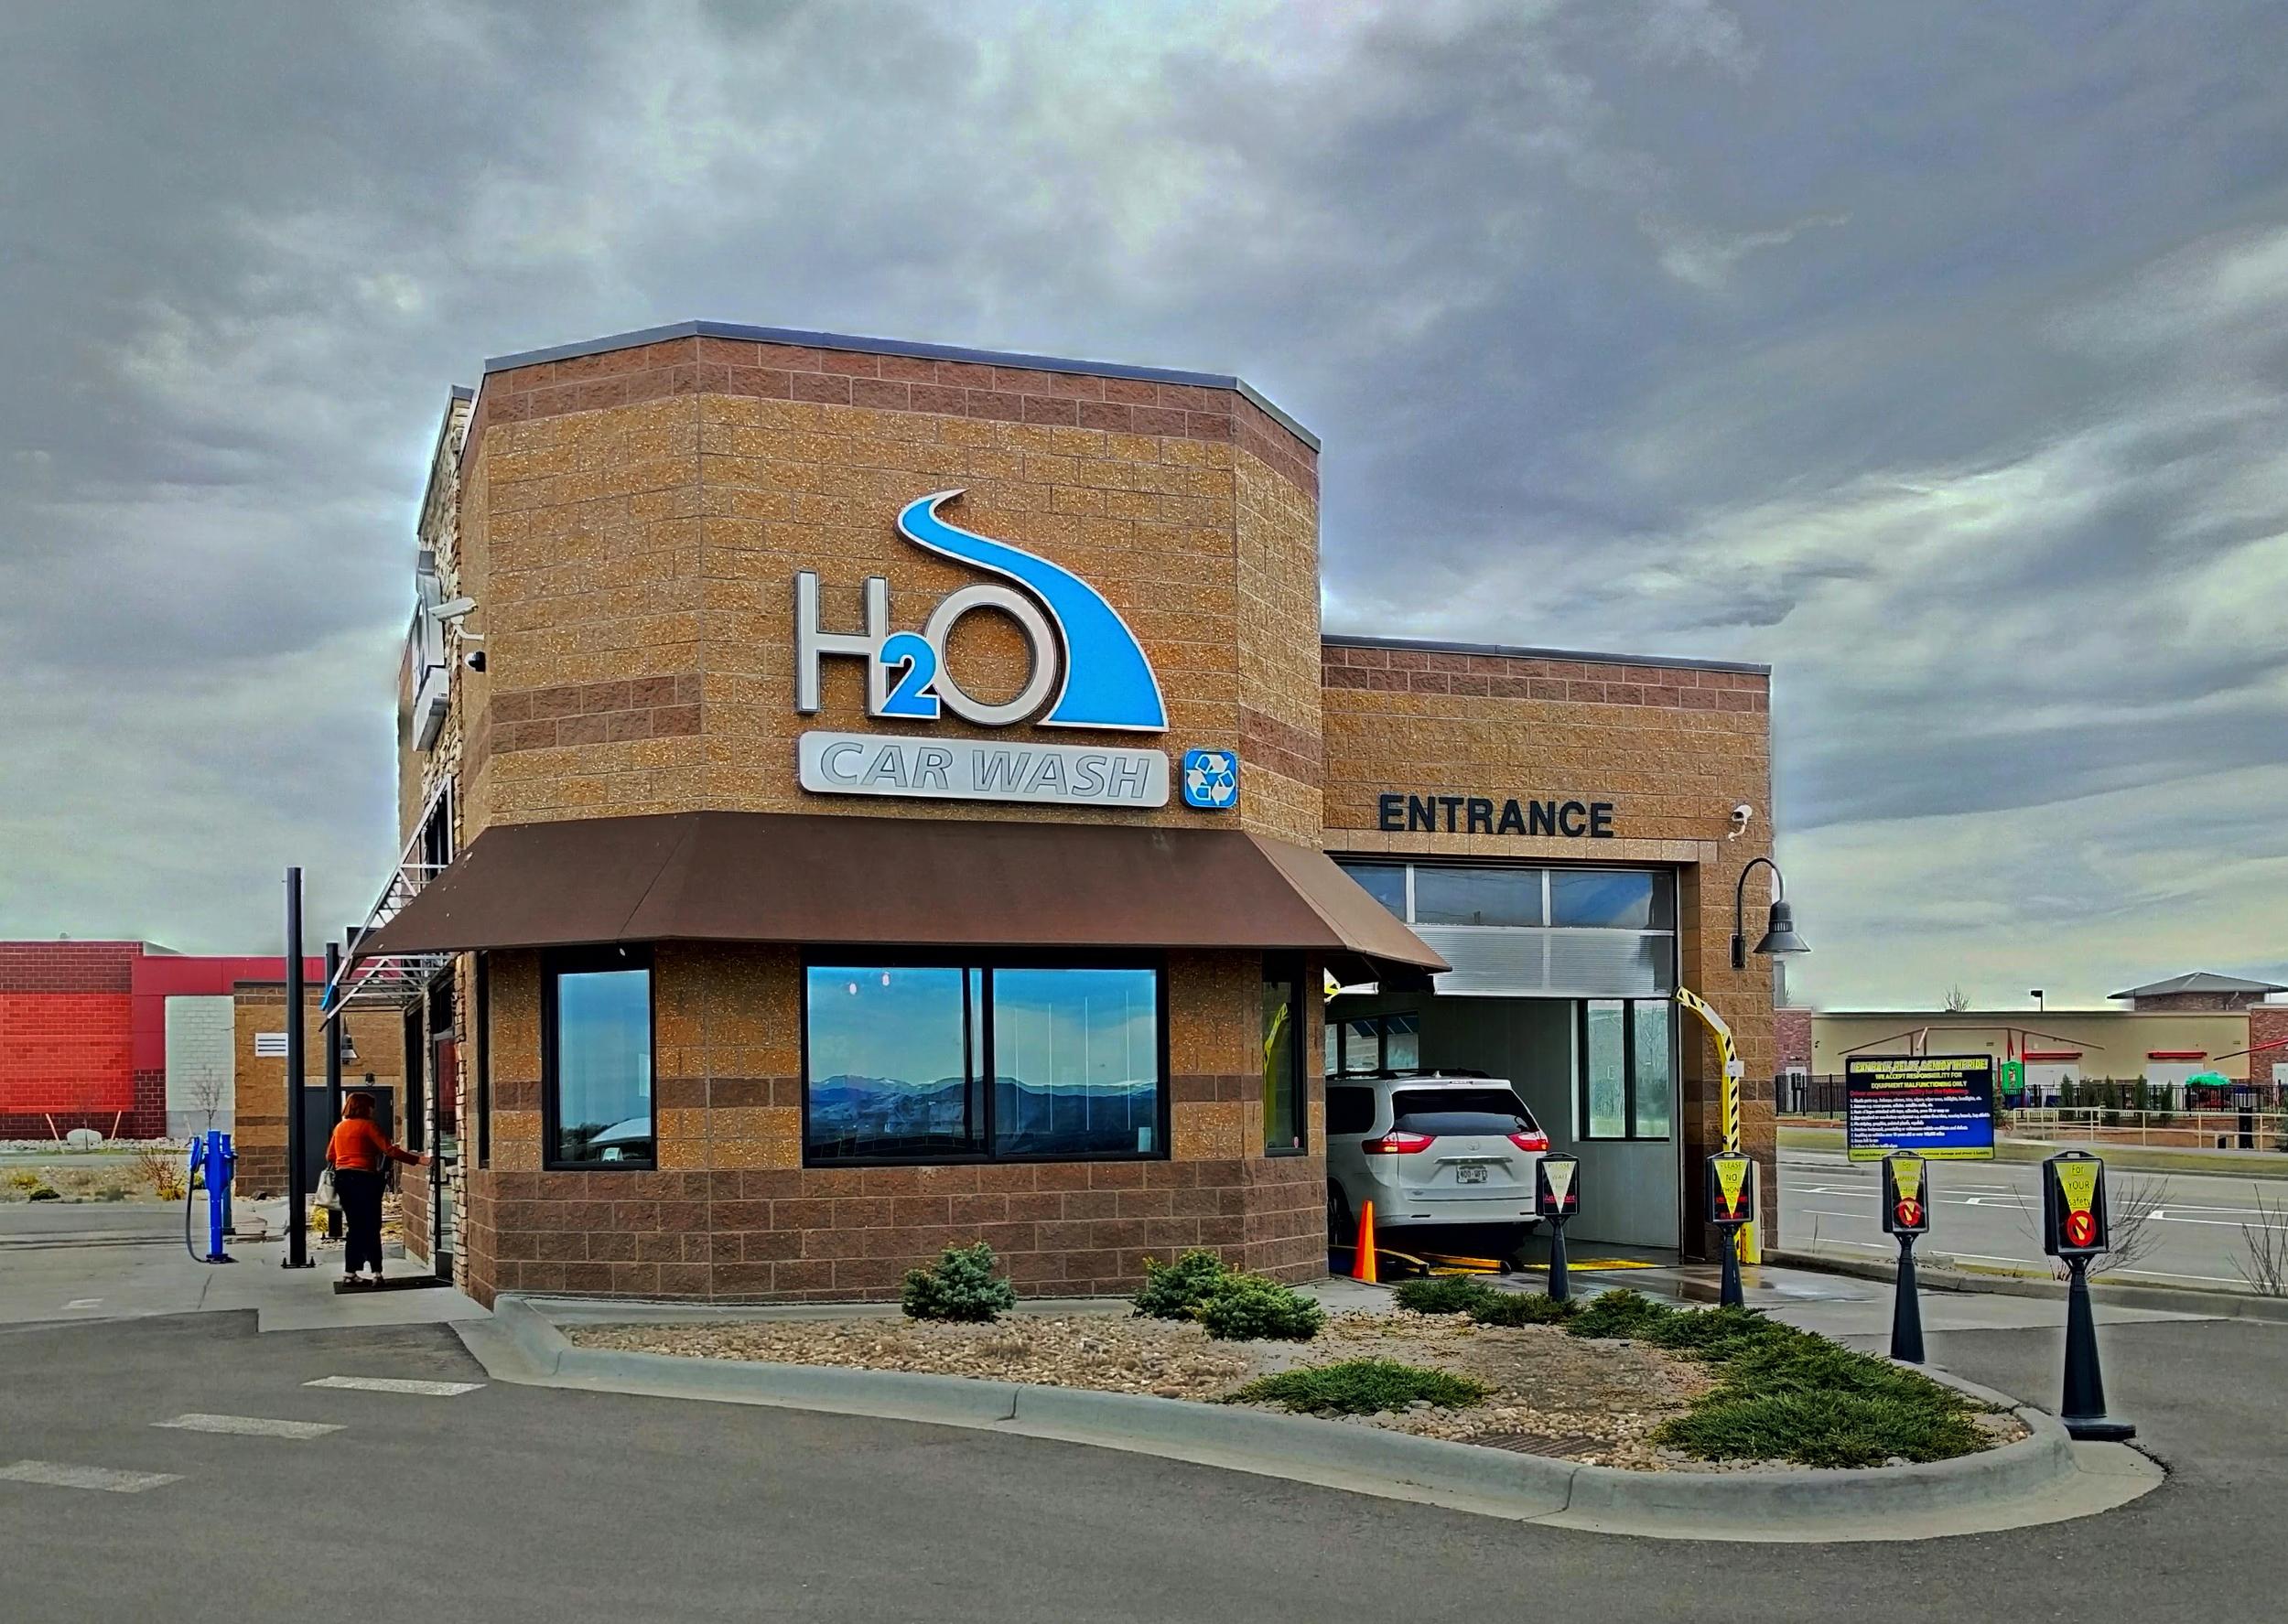 H20 Carwash in Highland Ranch, CO.